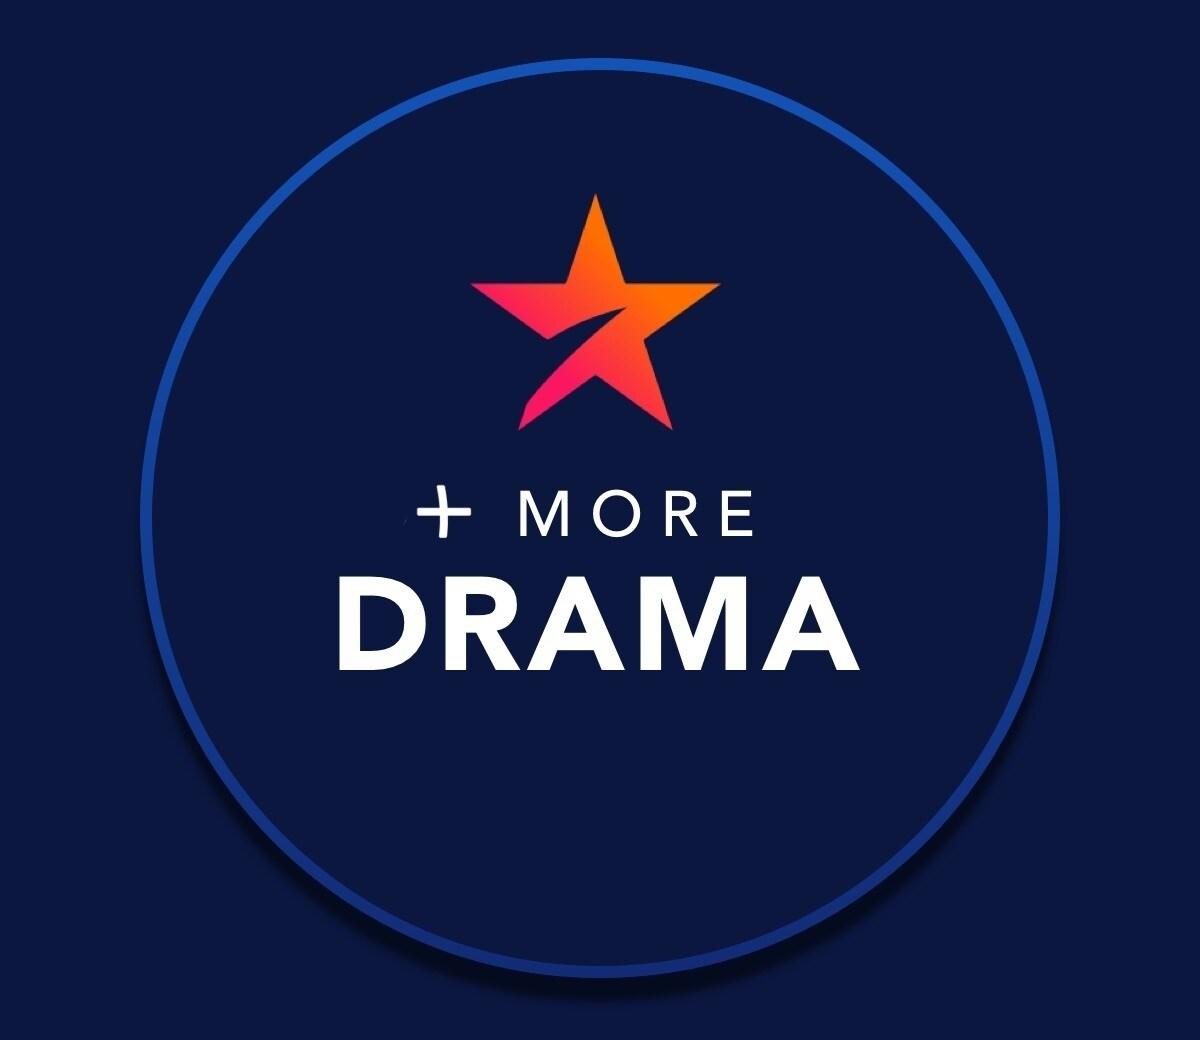 + More drama